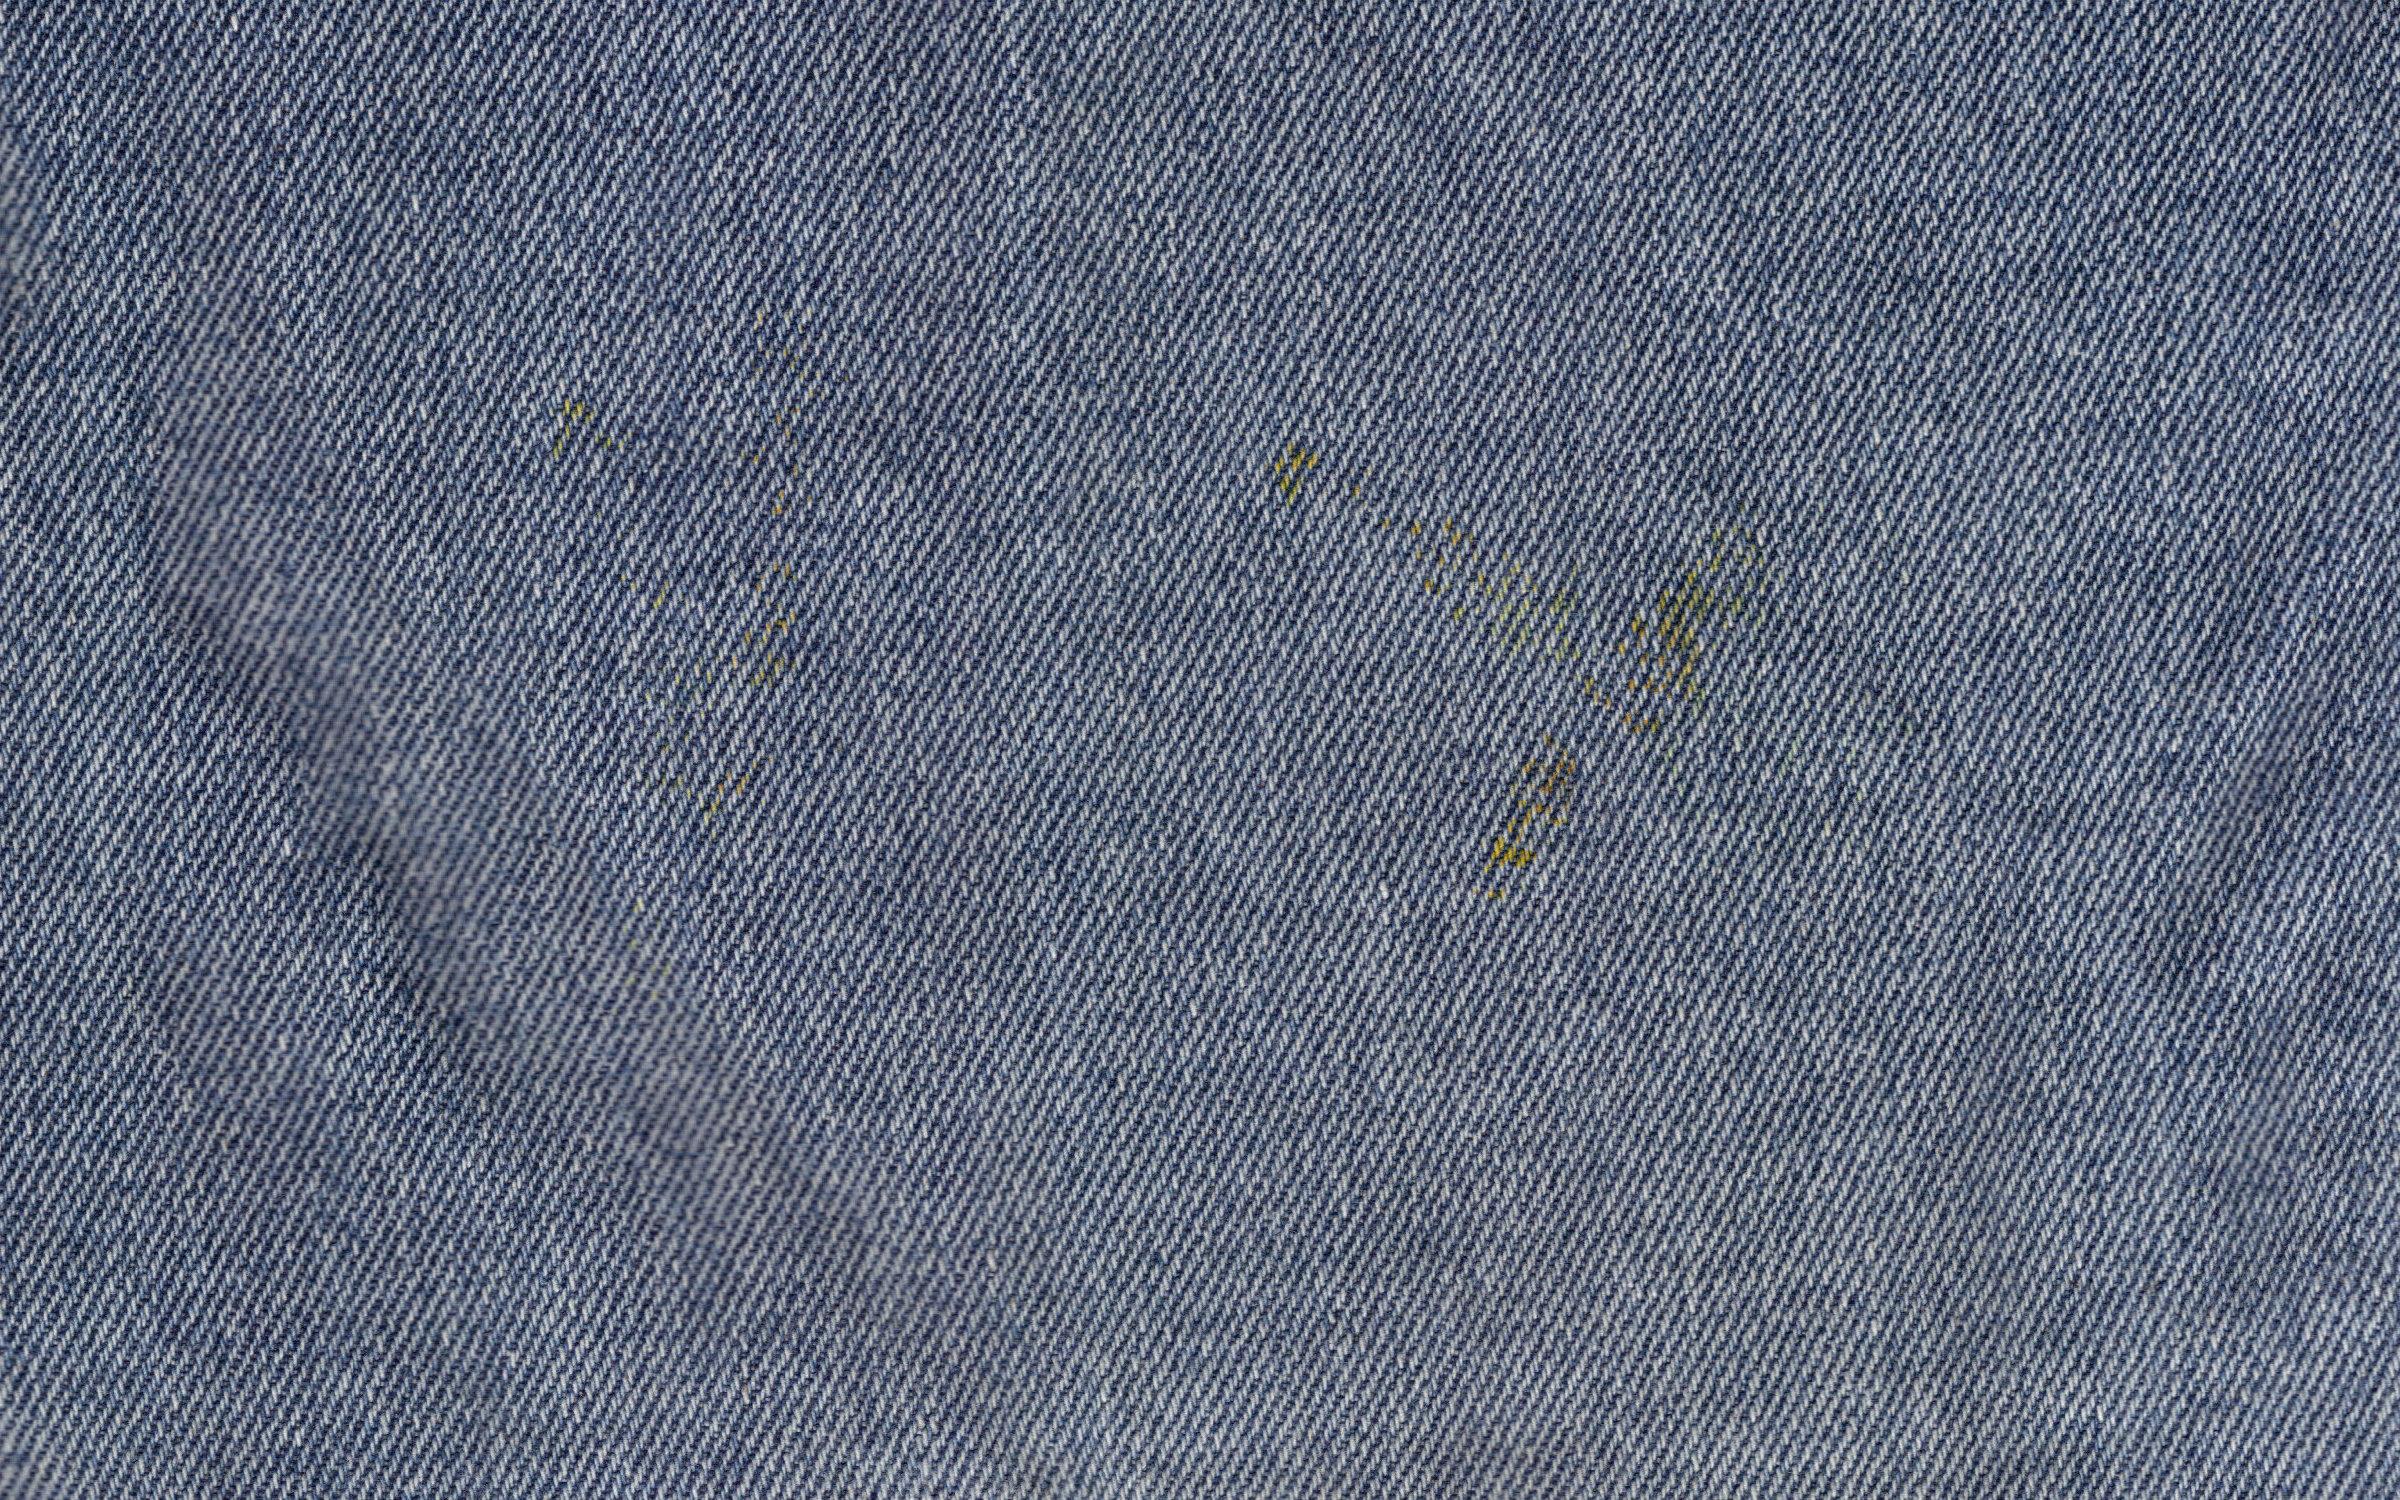 4 Denim Jeans Texture Set (JPG)   OnlyGFX.com